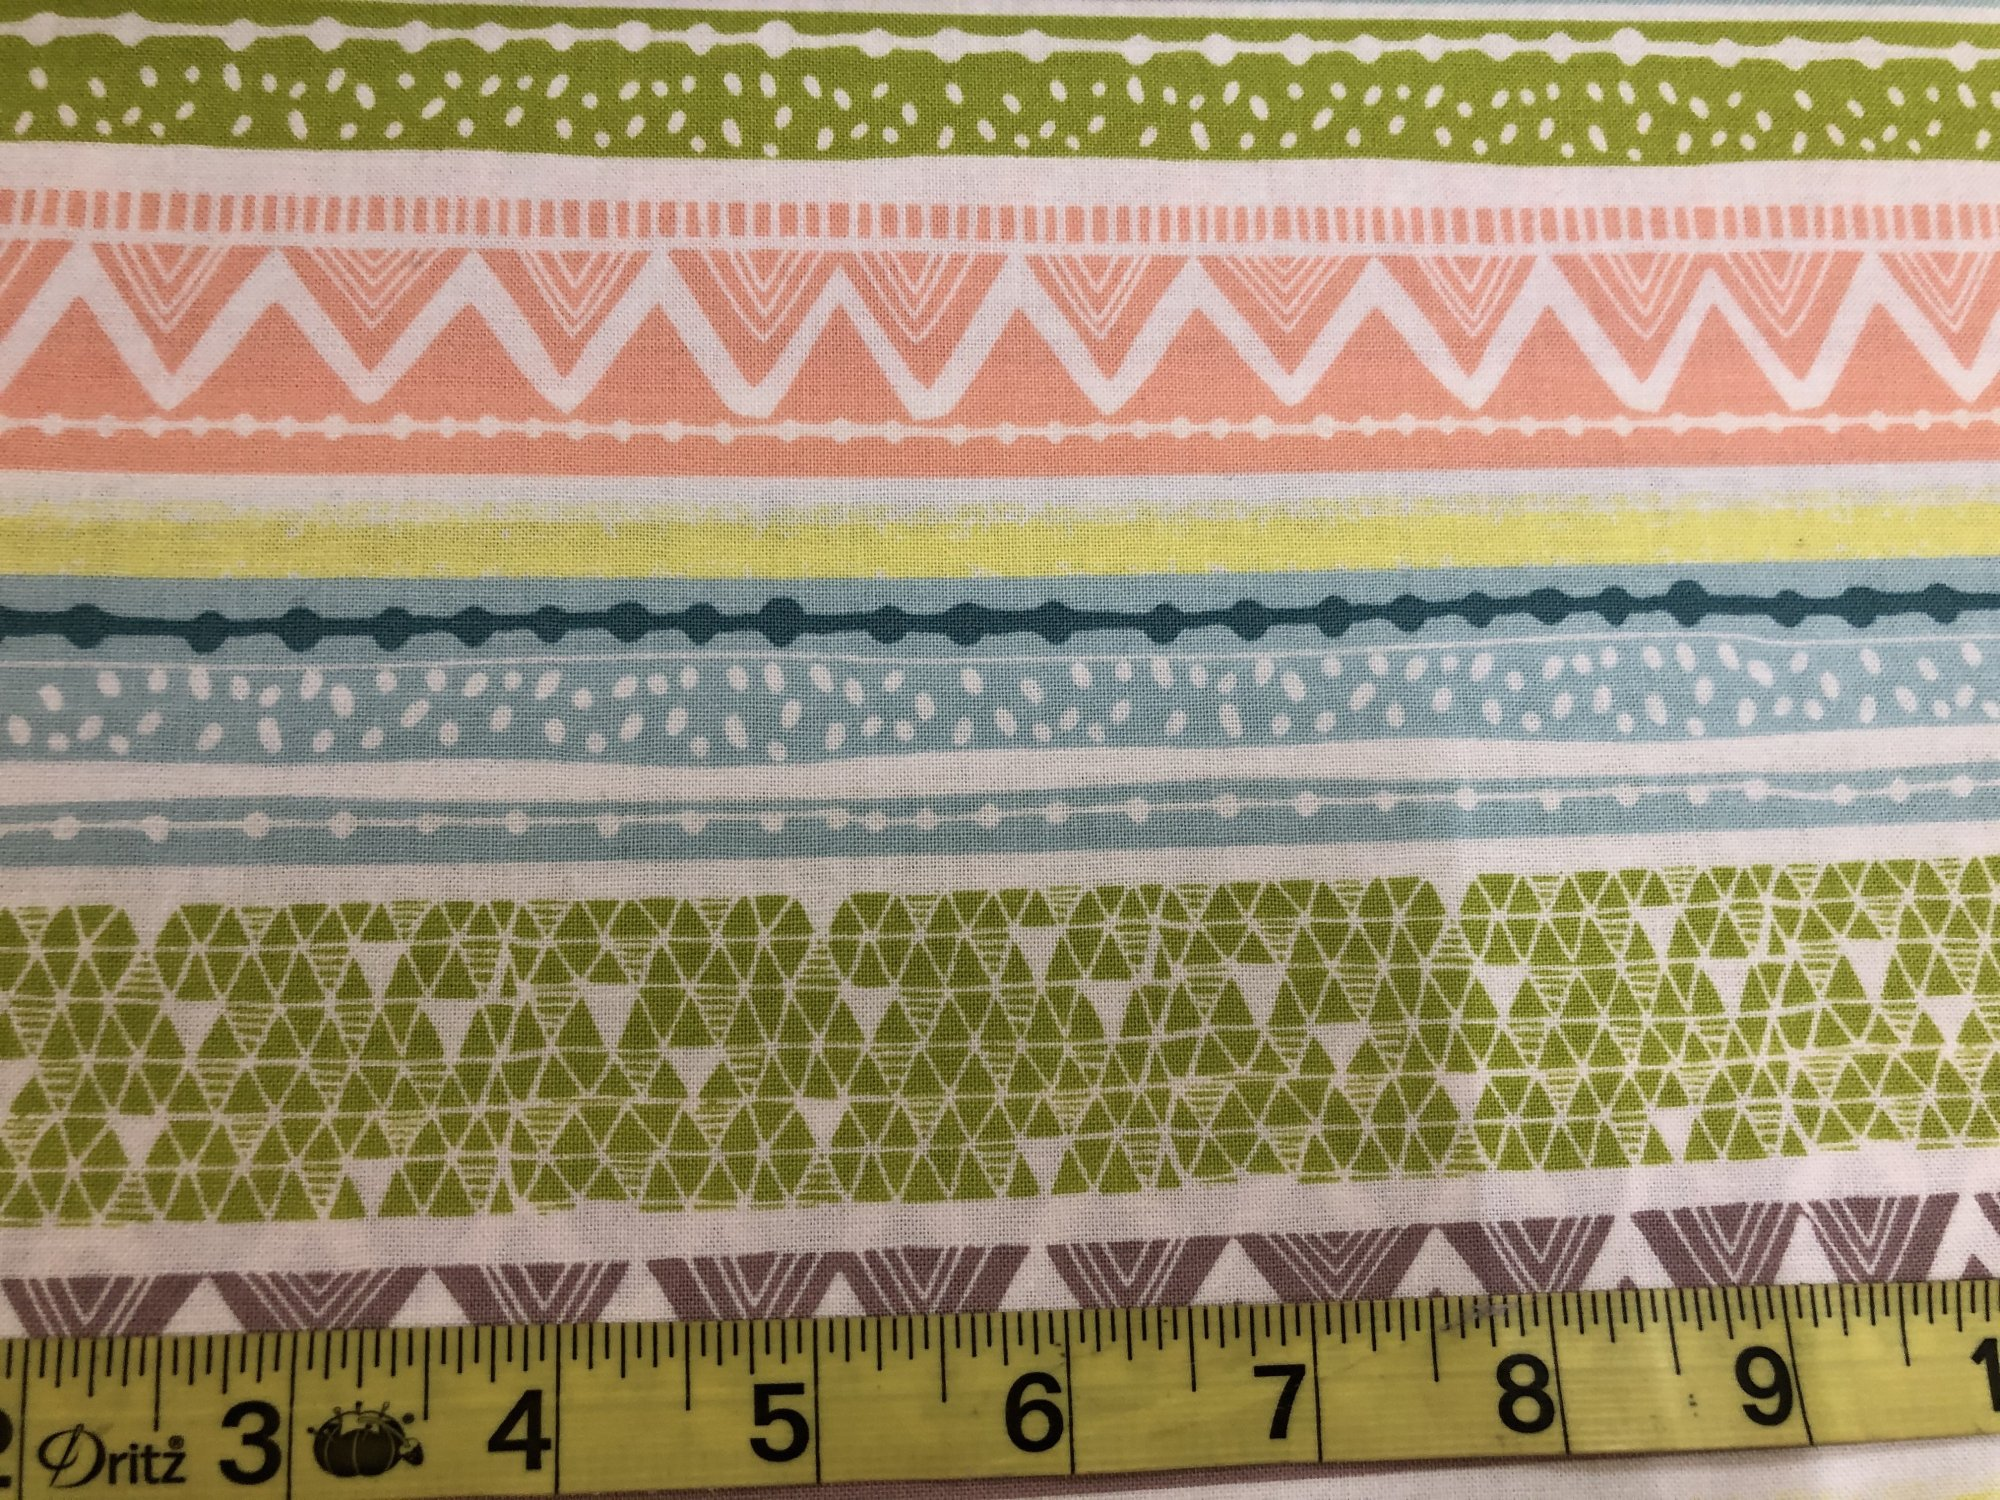 Geometric patterns in stripes